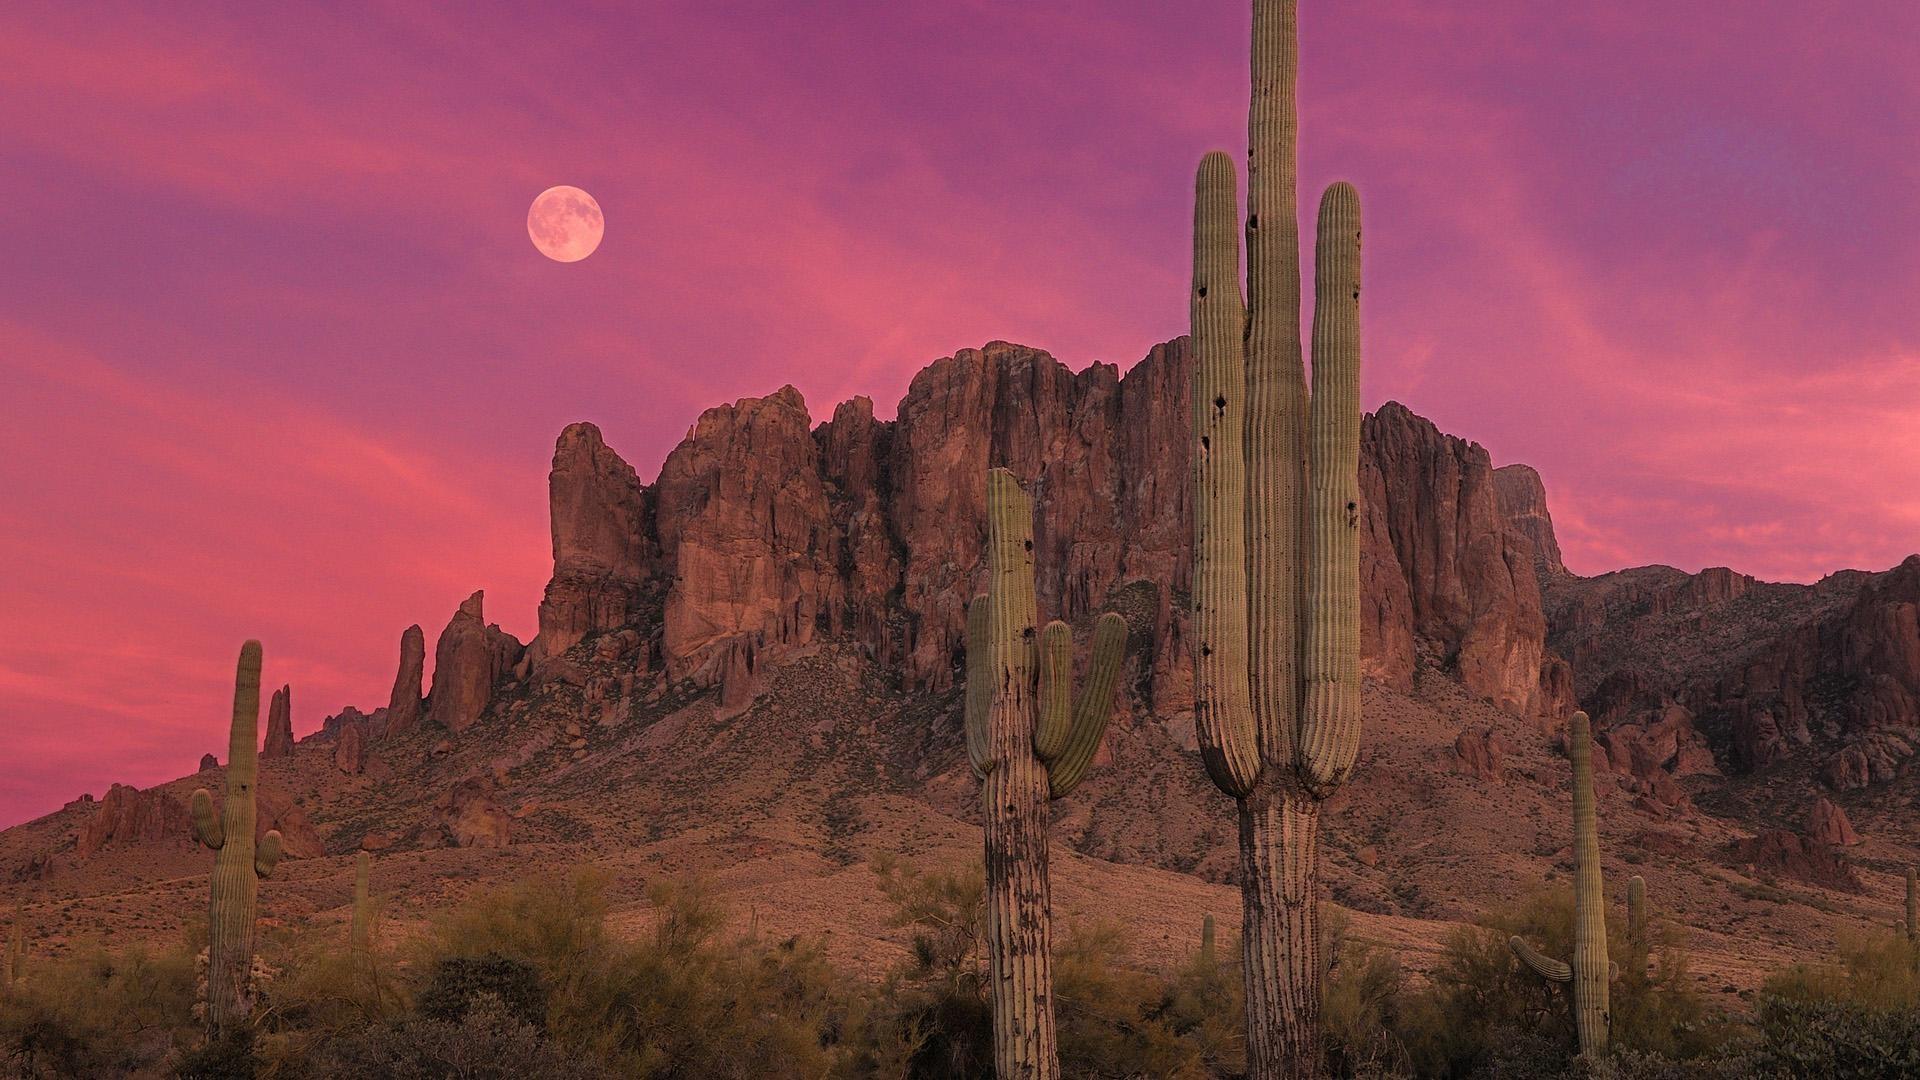 1499614-amazing-arizona-hd-wallpaper-1920x1080-for-mac.jpg